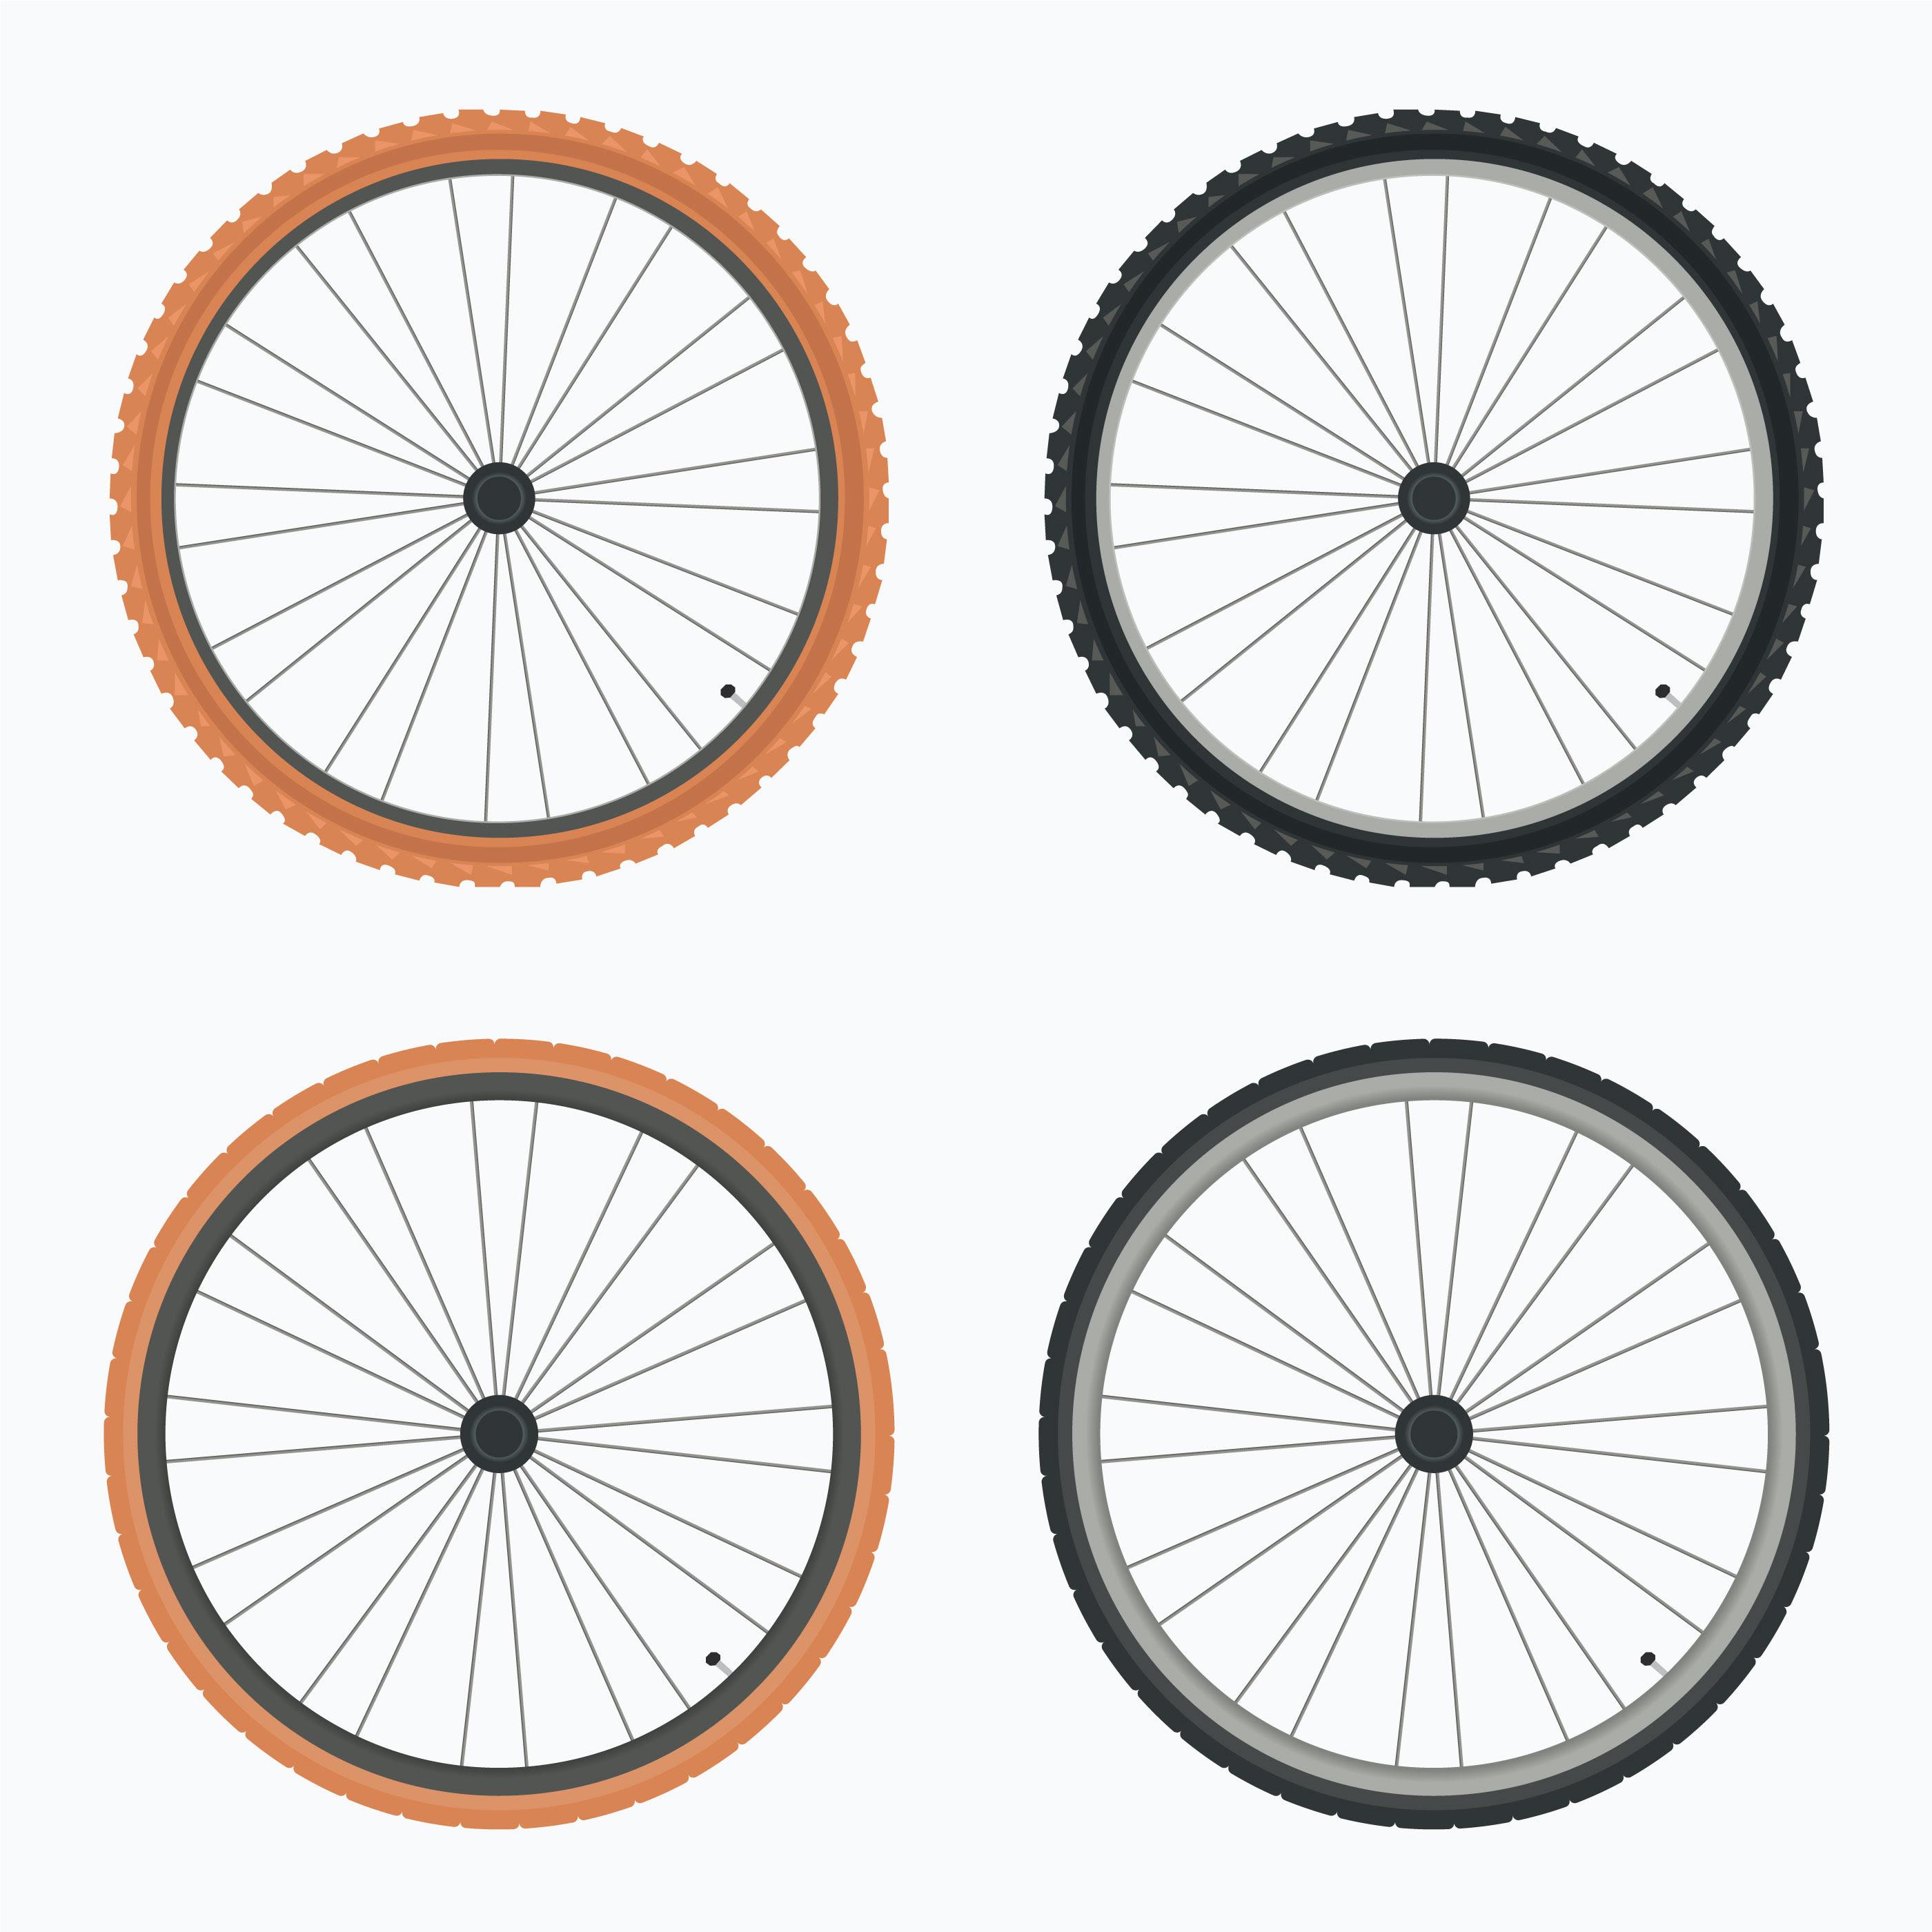 Bike Tire Vector Download Free Vector Art Stock Graphics Images